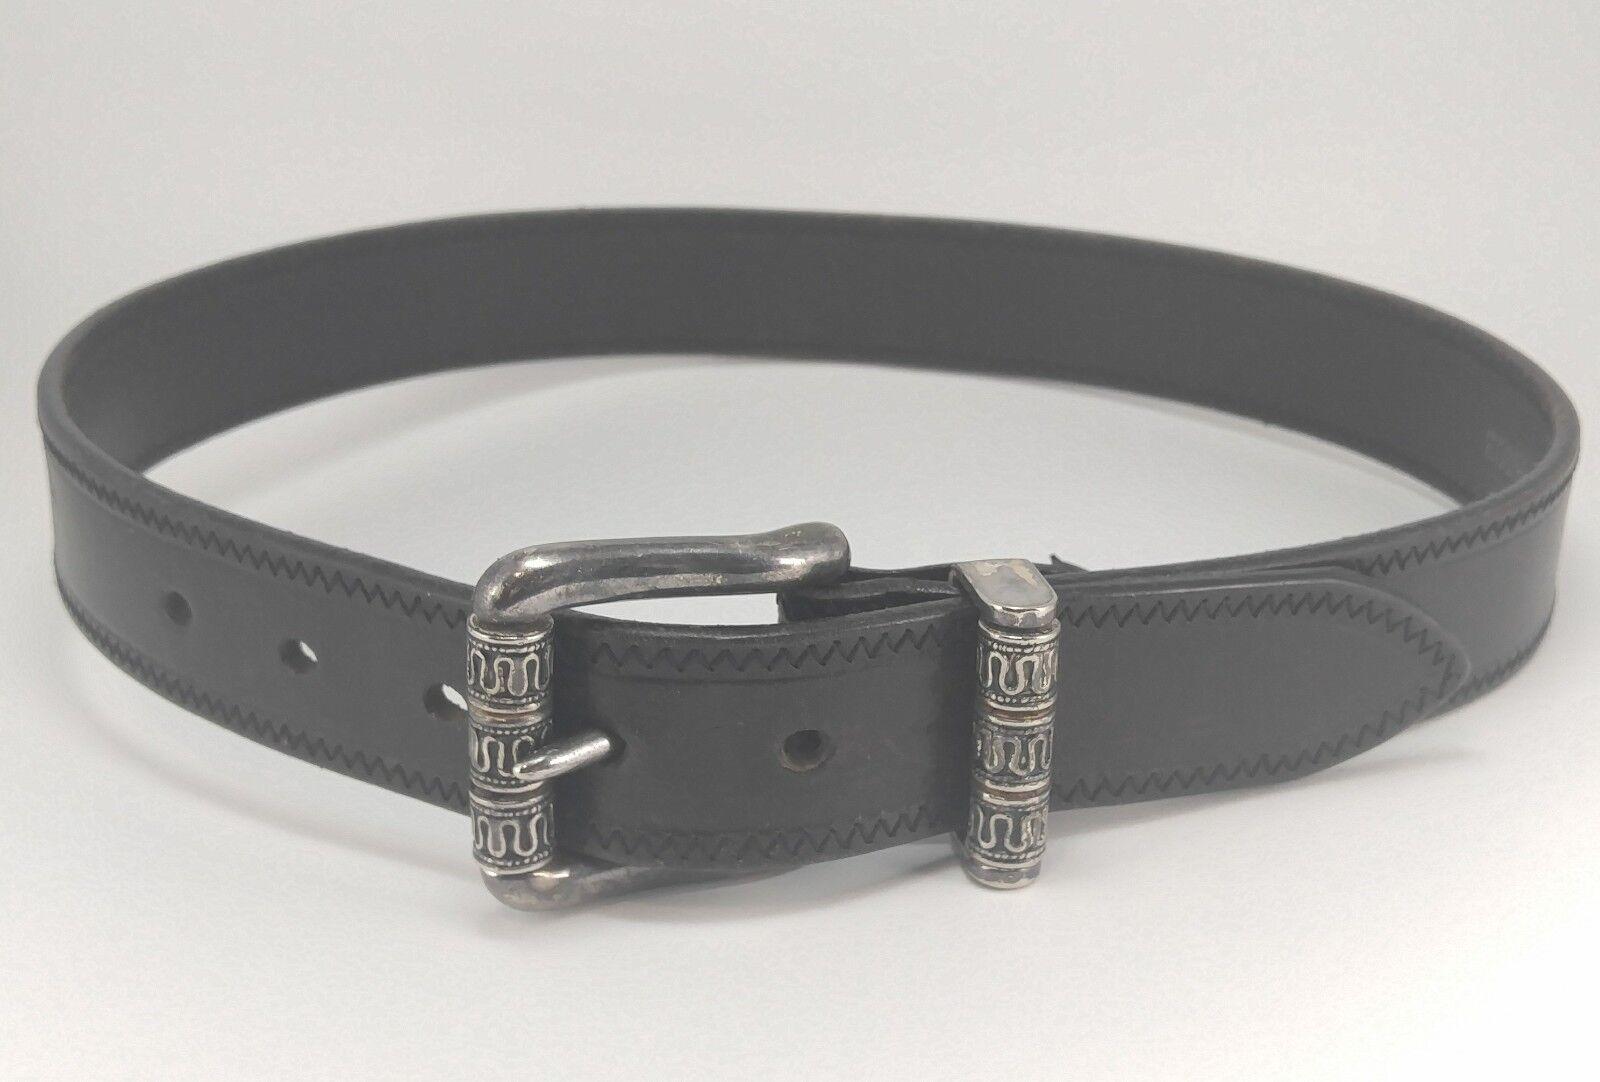 92bfbdd0e Vintage Brighton Black Leather Belt - Size Small